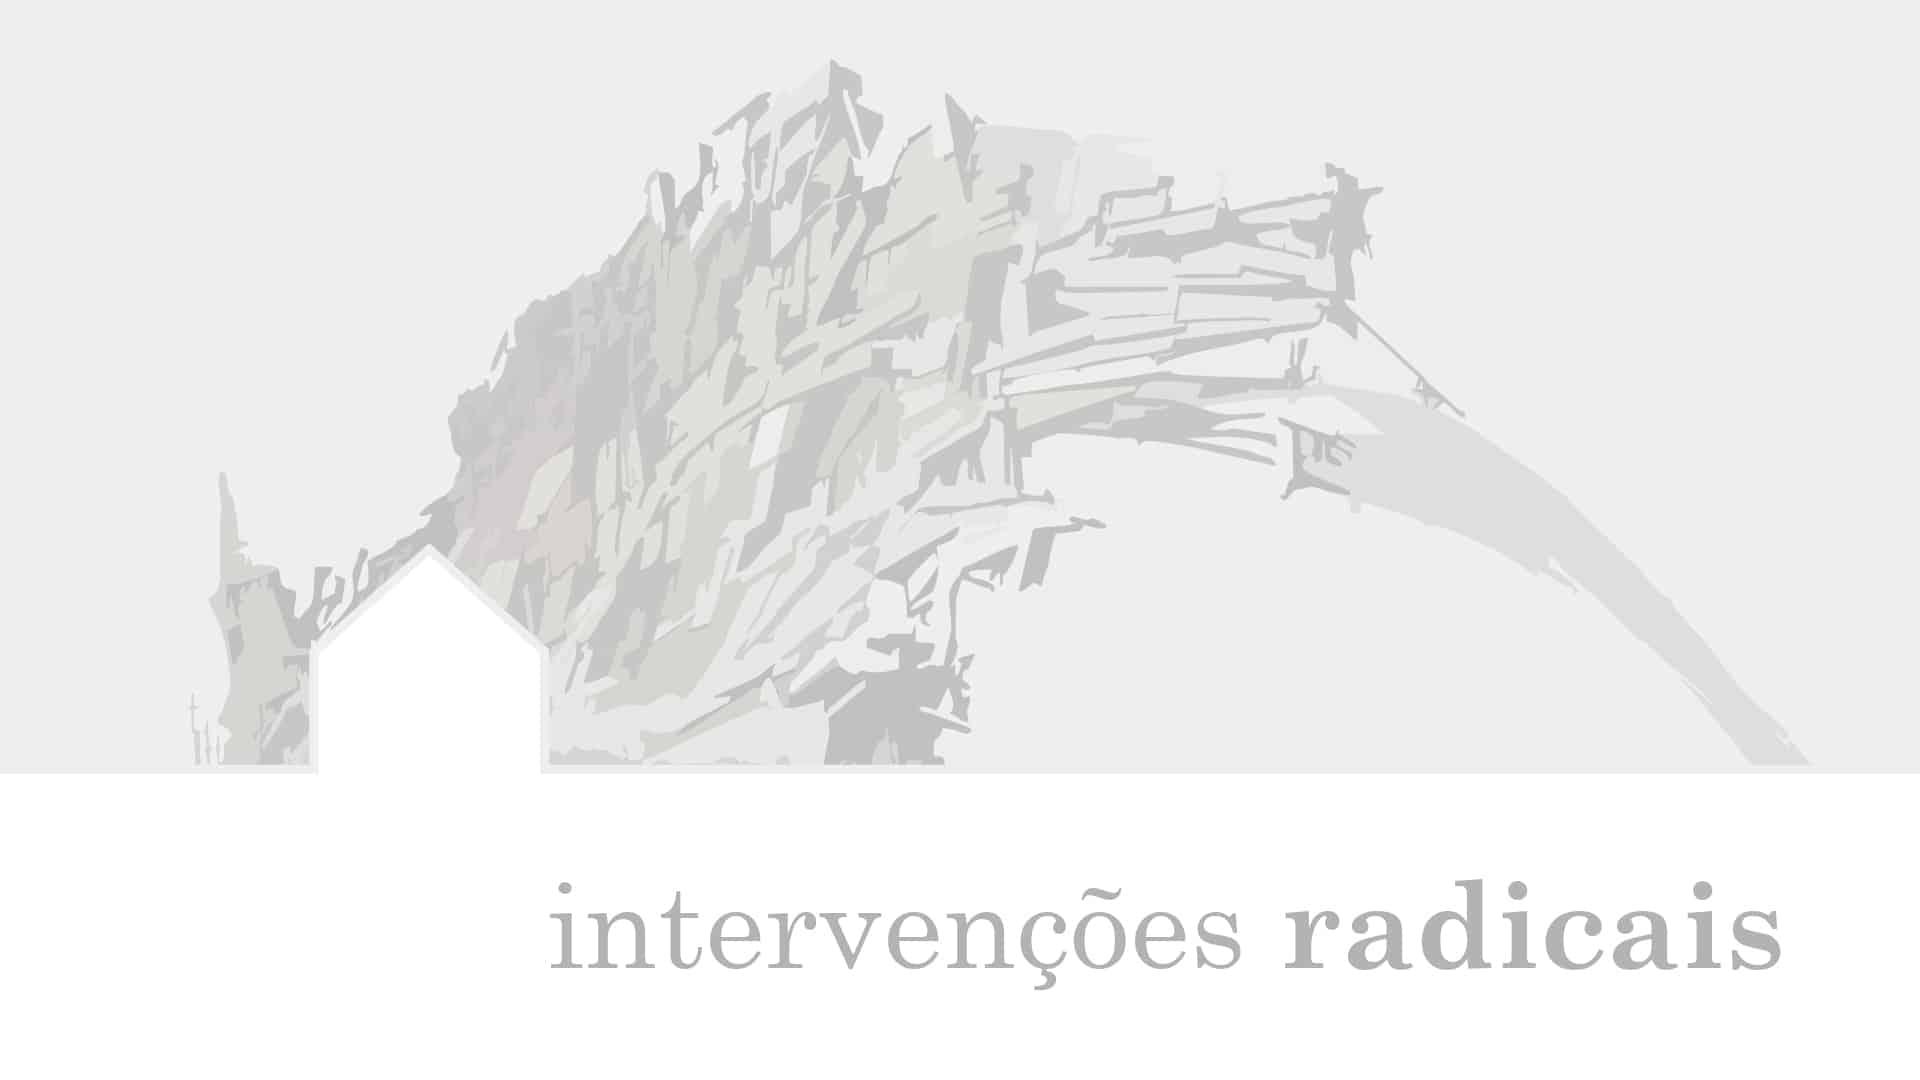 Intervencoes Radicais